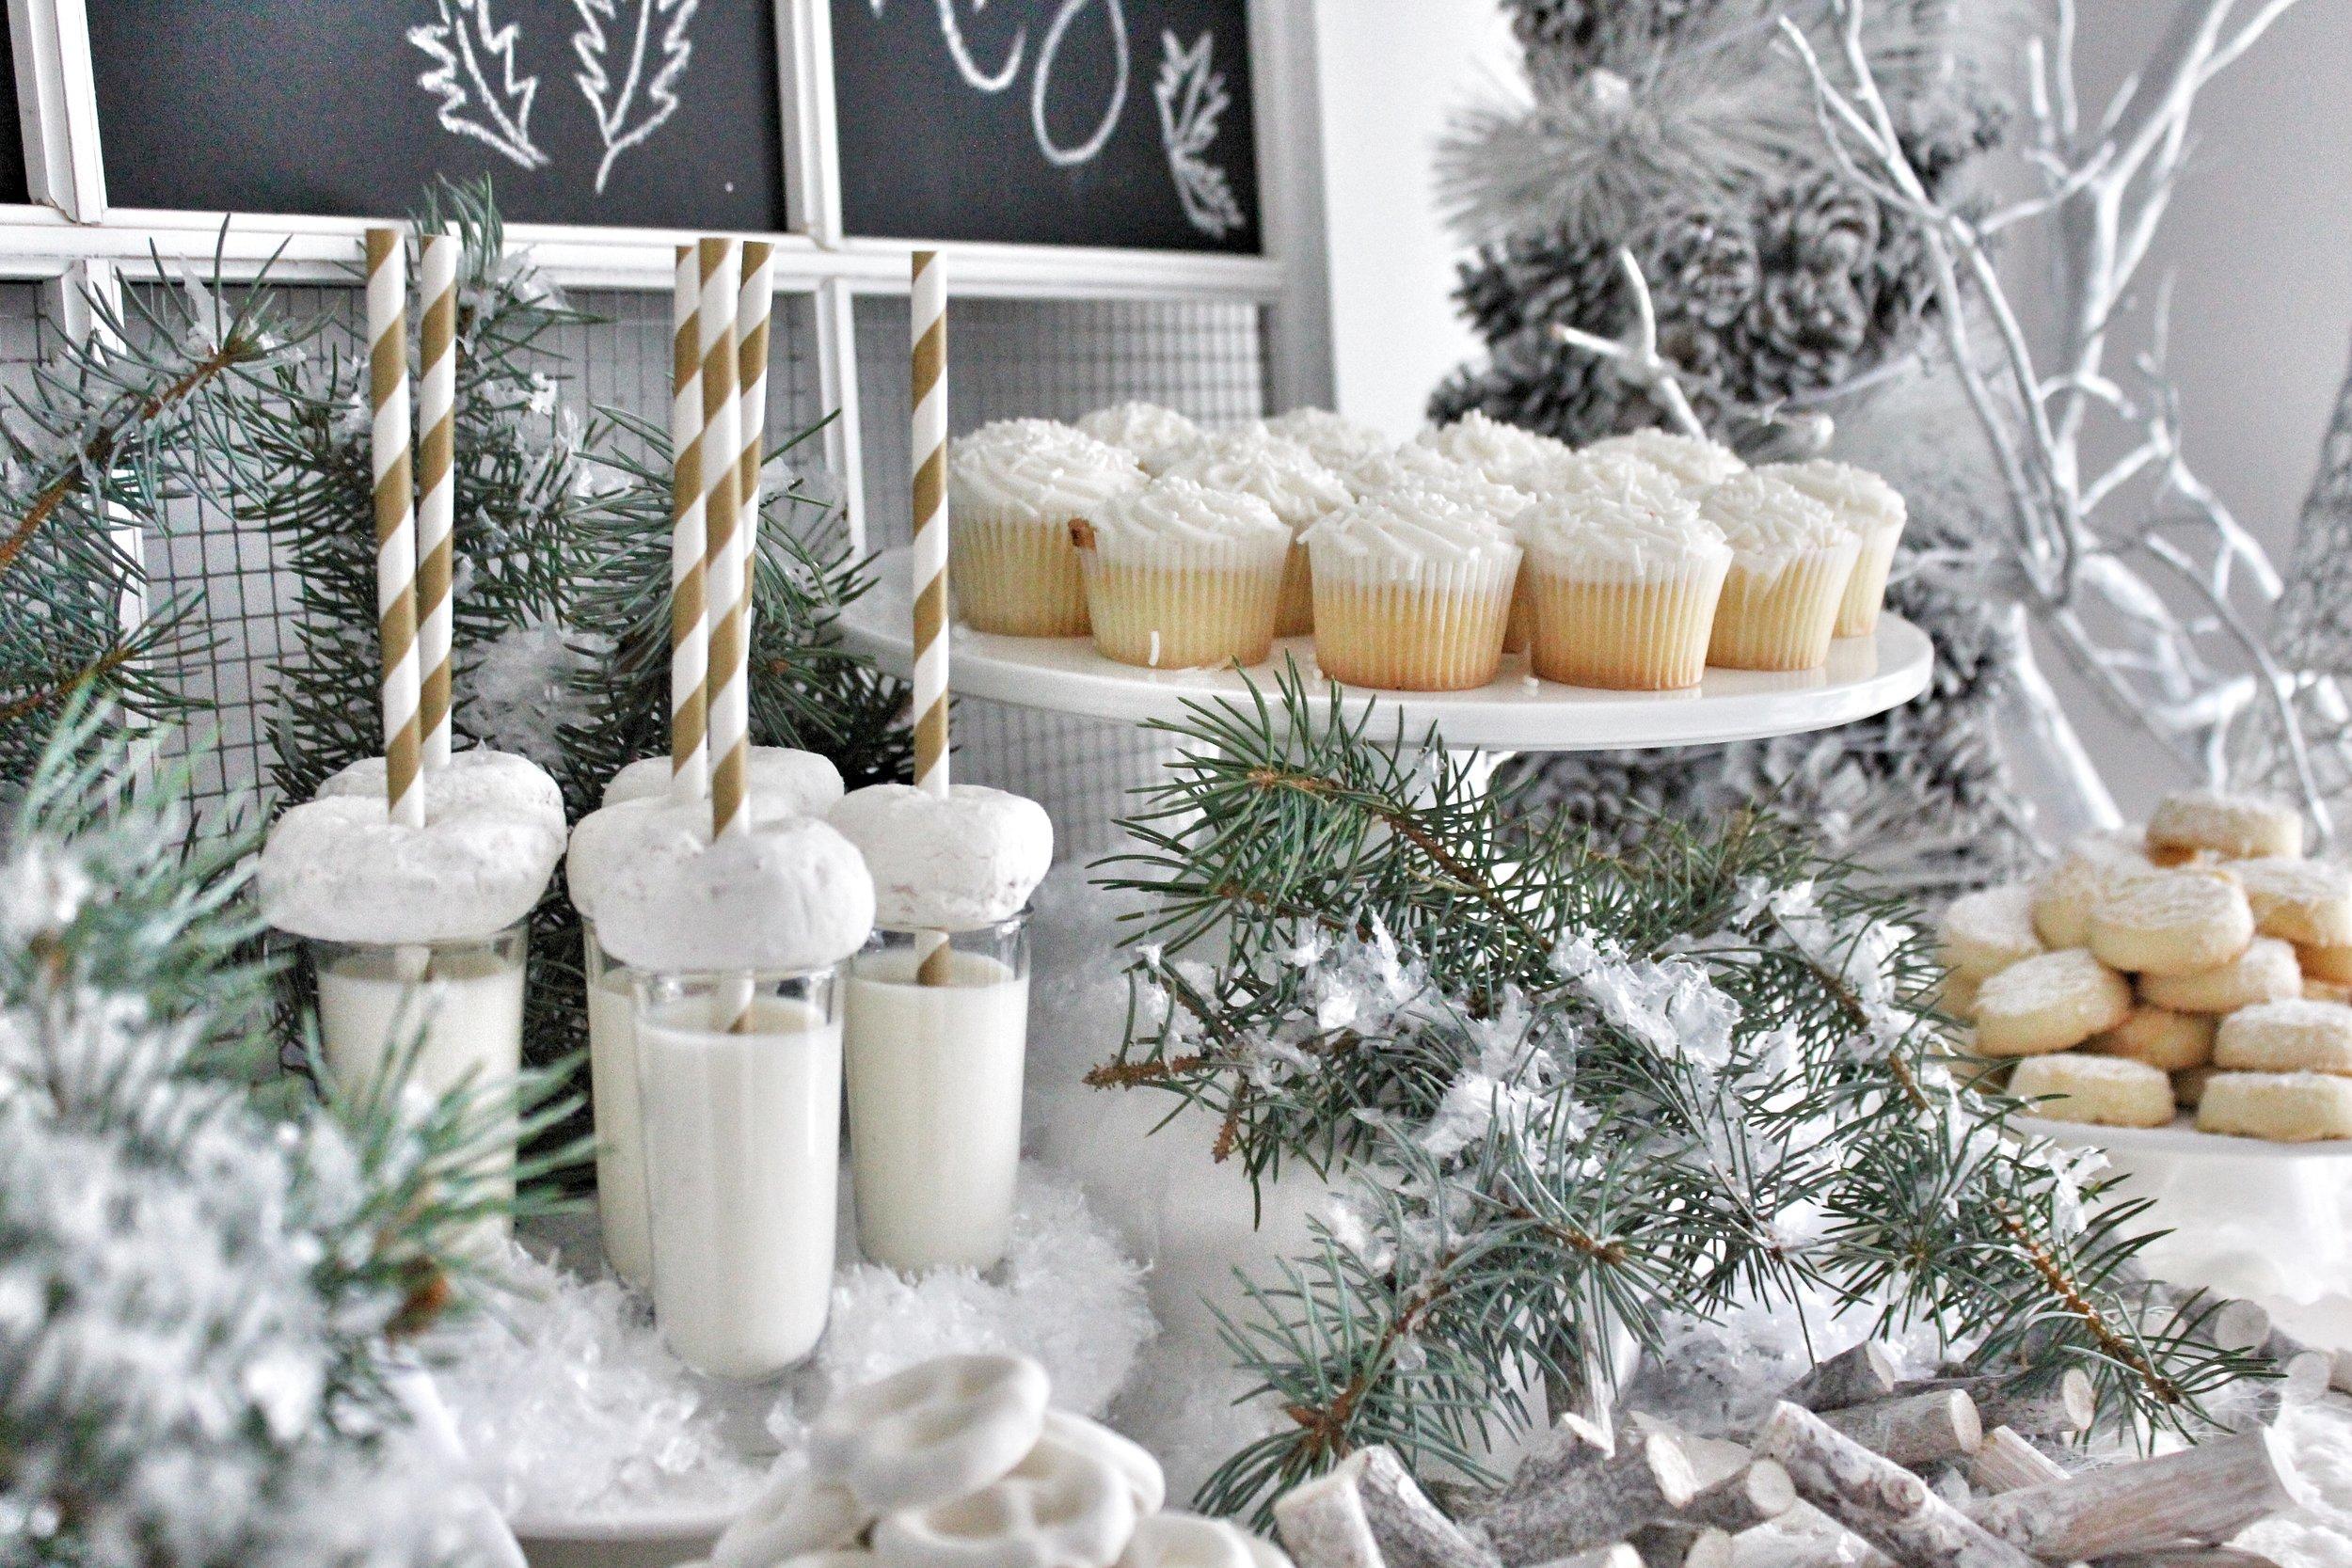 jingle-mingle-dessert-bar-4-1217.jpg